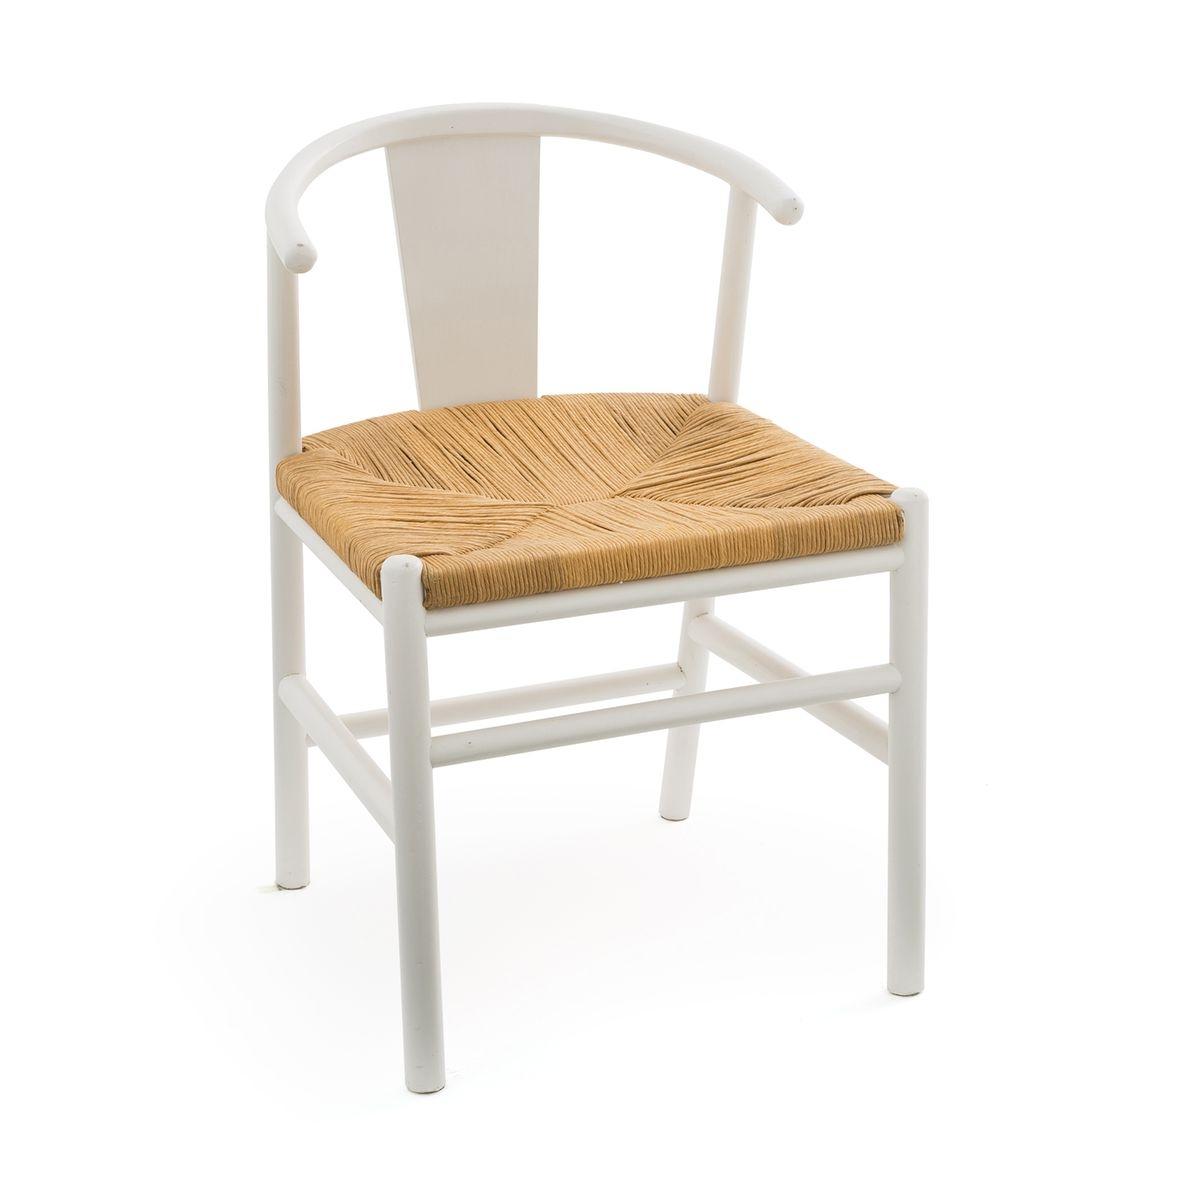 Chaise enveloppante